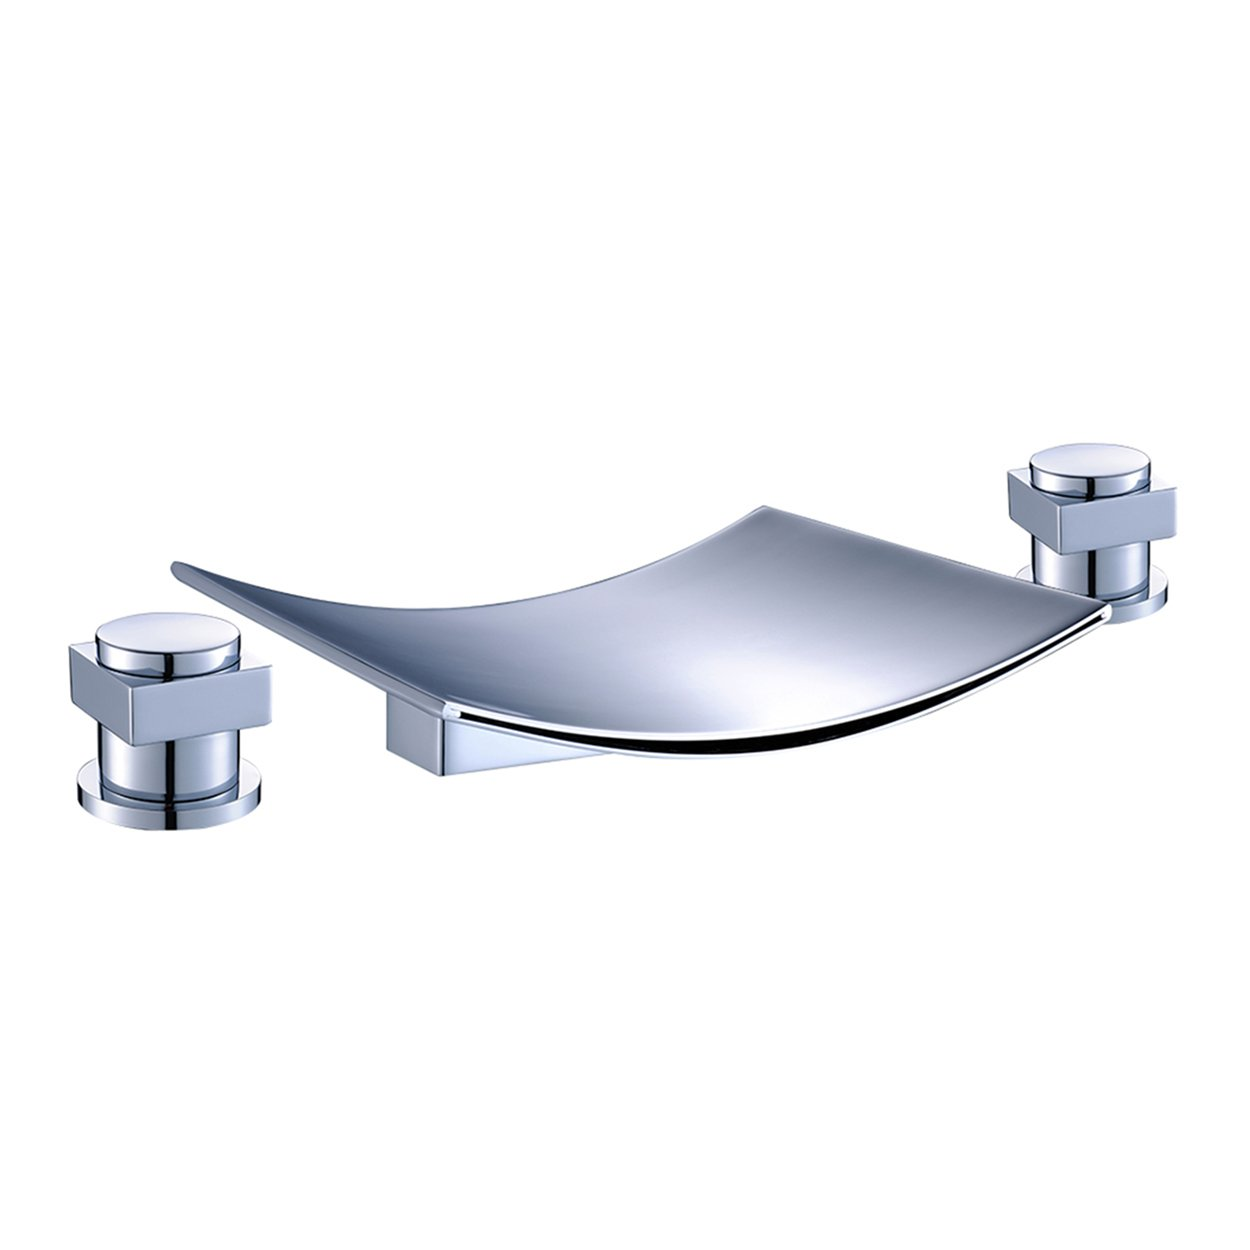 FLG Deck Mount Two Handle Widespread Waterfall Bathroom Bath Tub Faucet Chrome 7.5 inch Spout